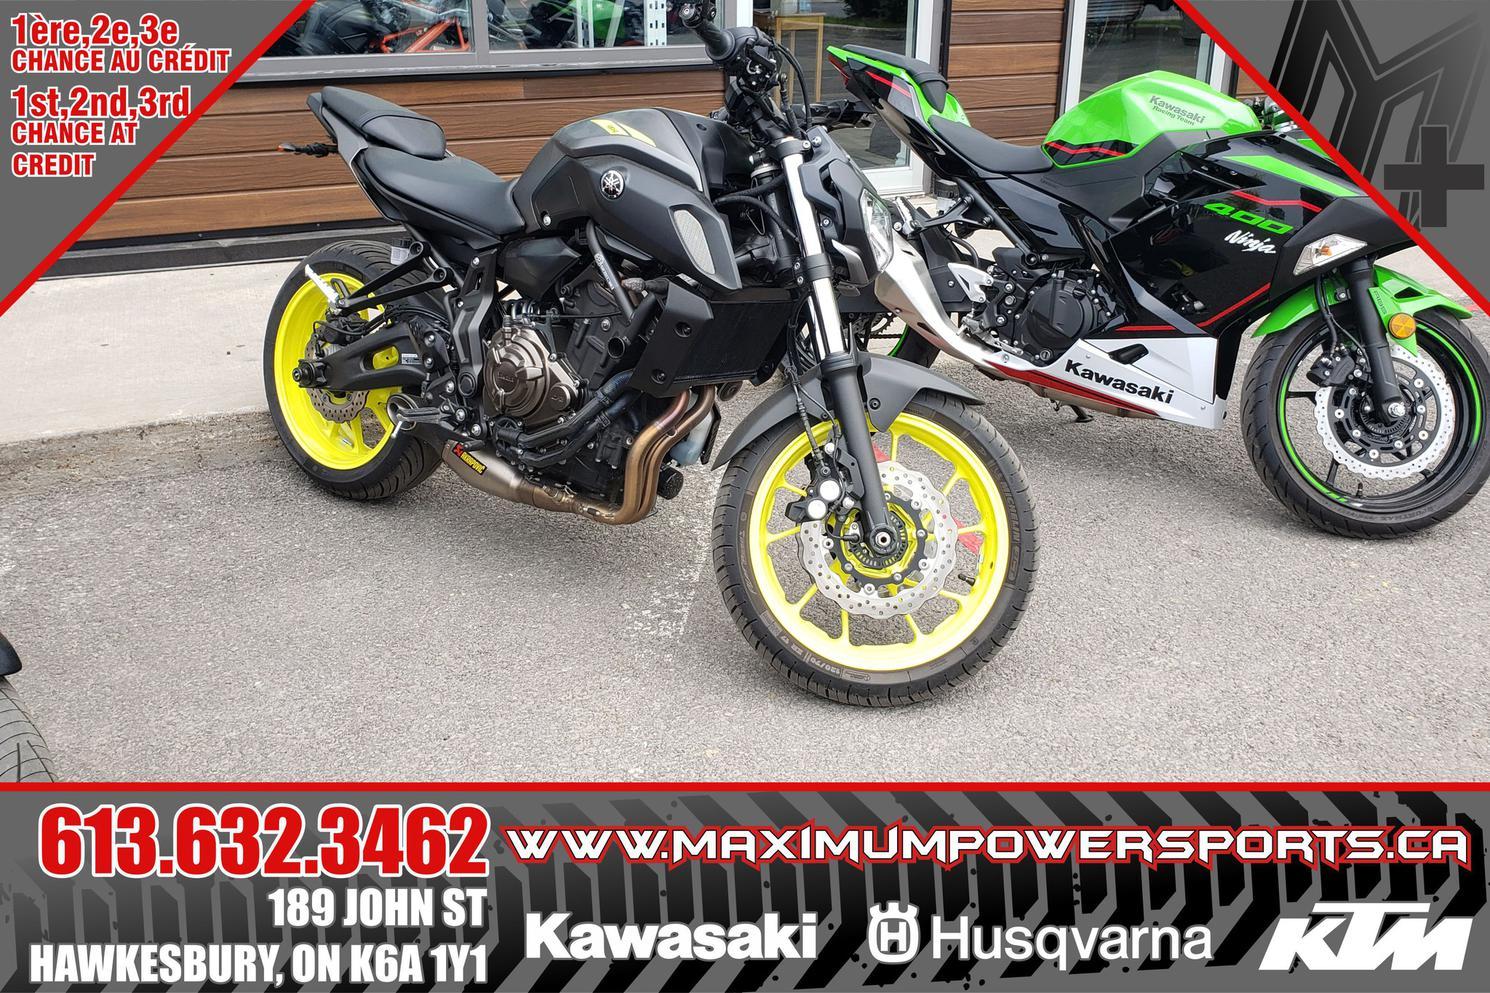 Yamaha MT-07 2018 - MT-07